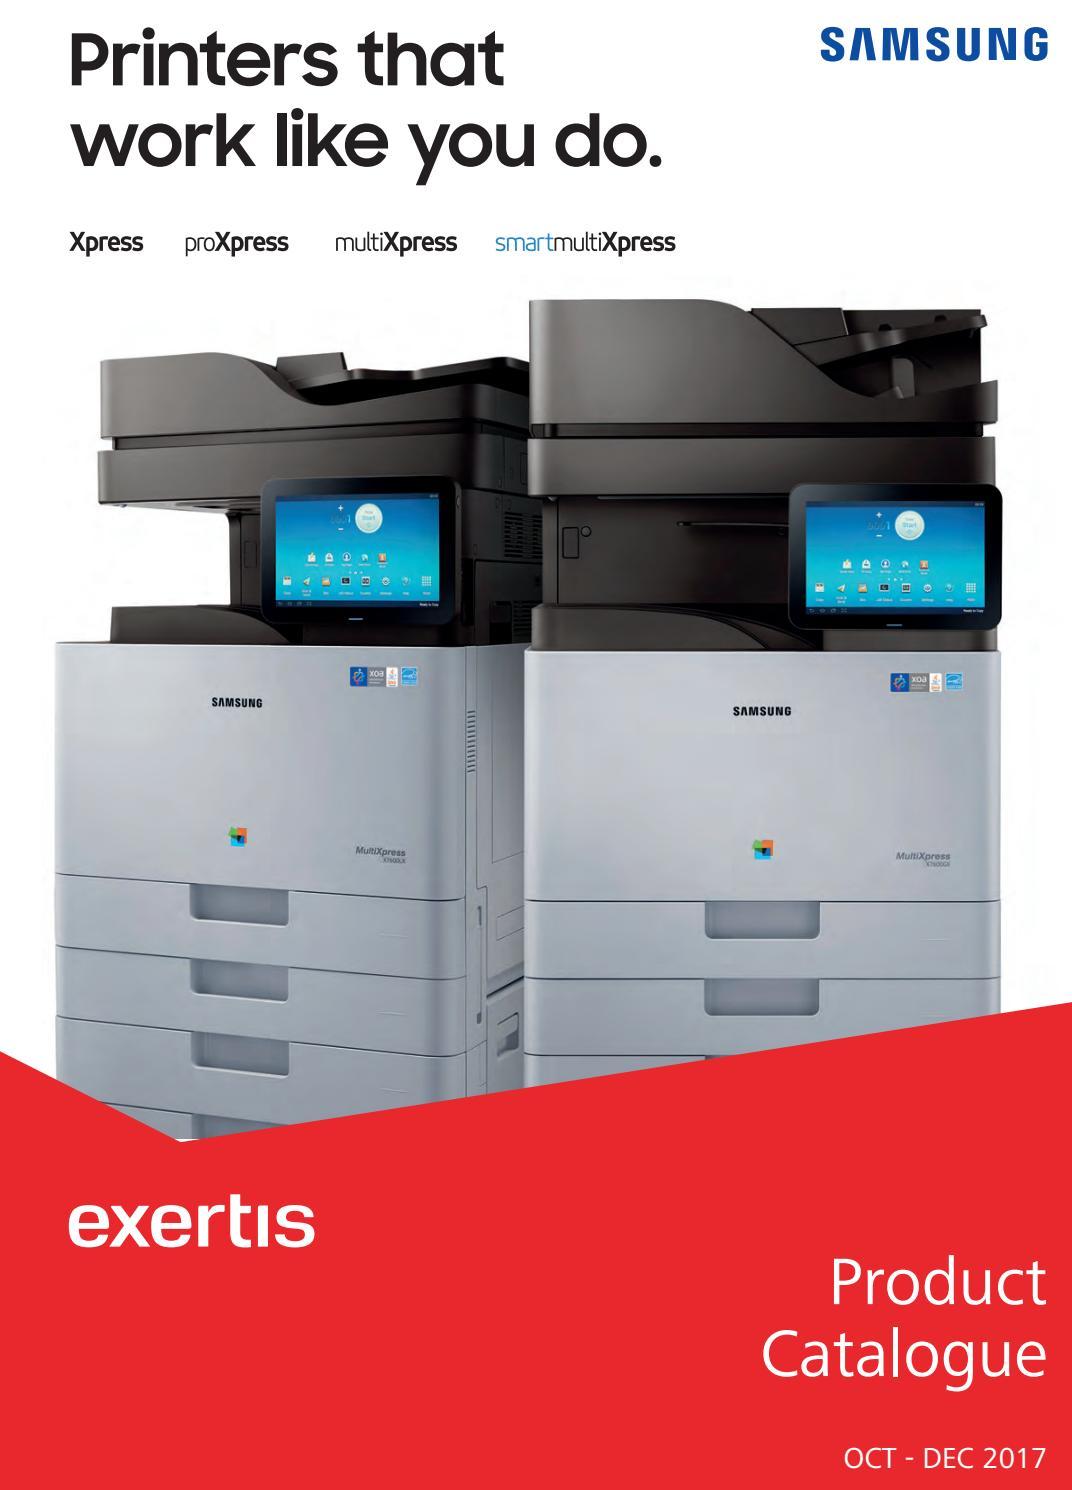 Product Catalogue by ExertisMarketing - issuu